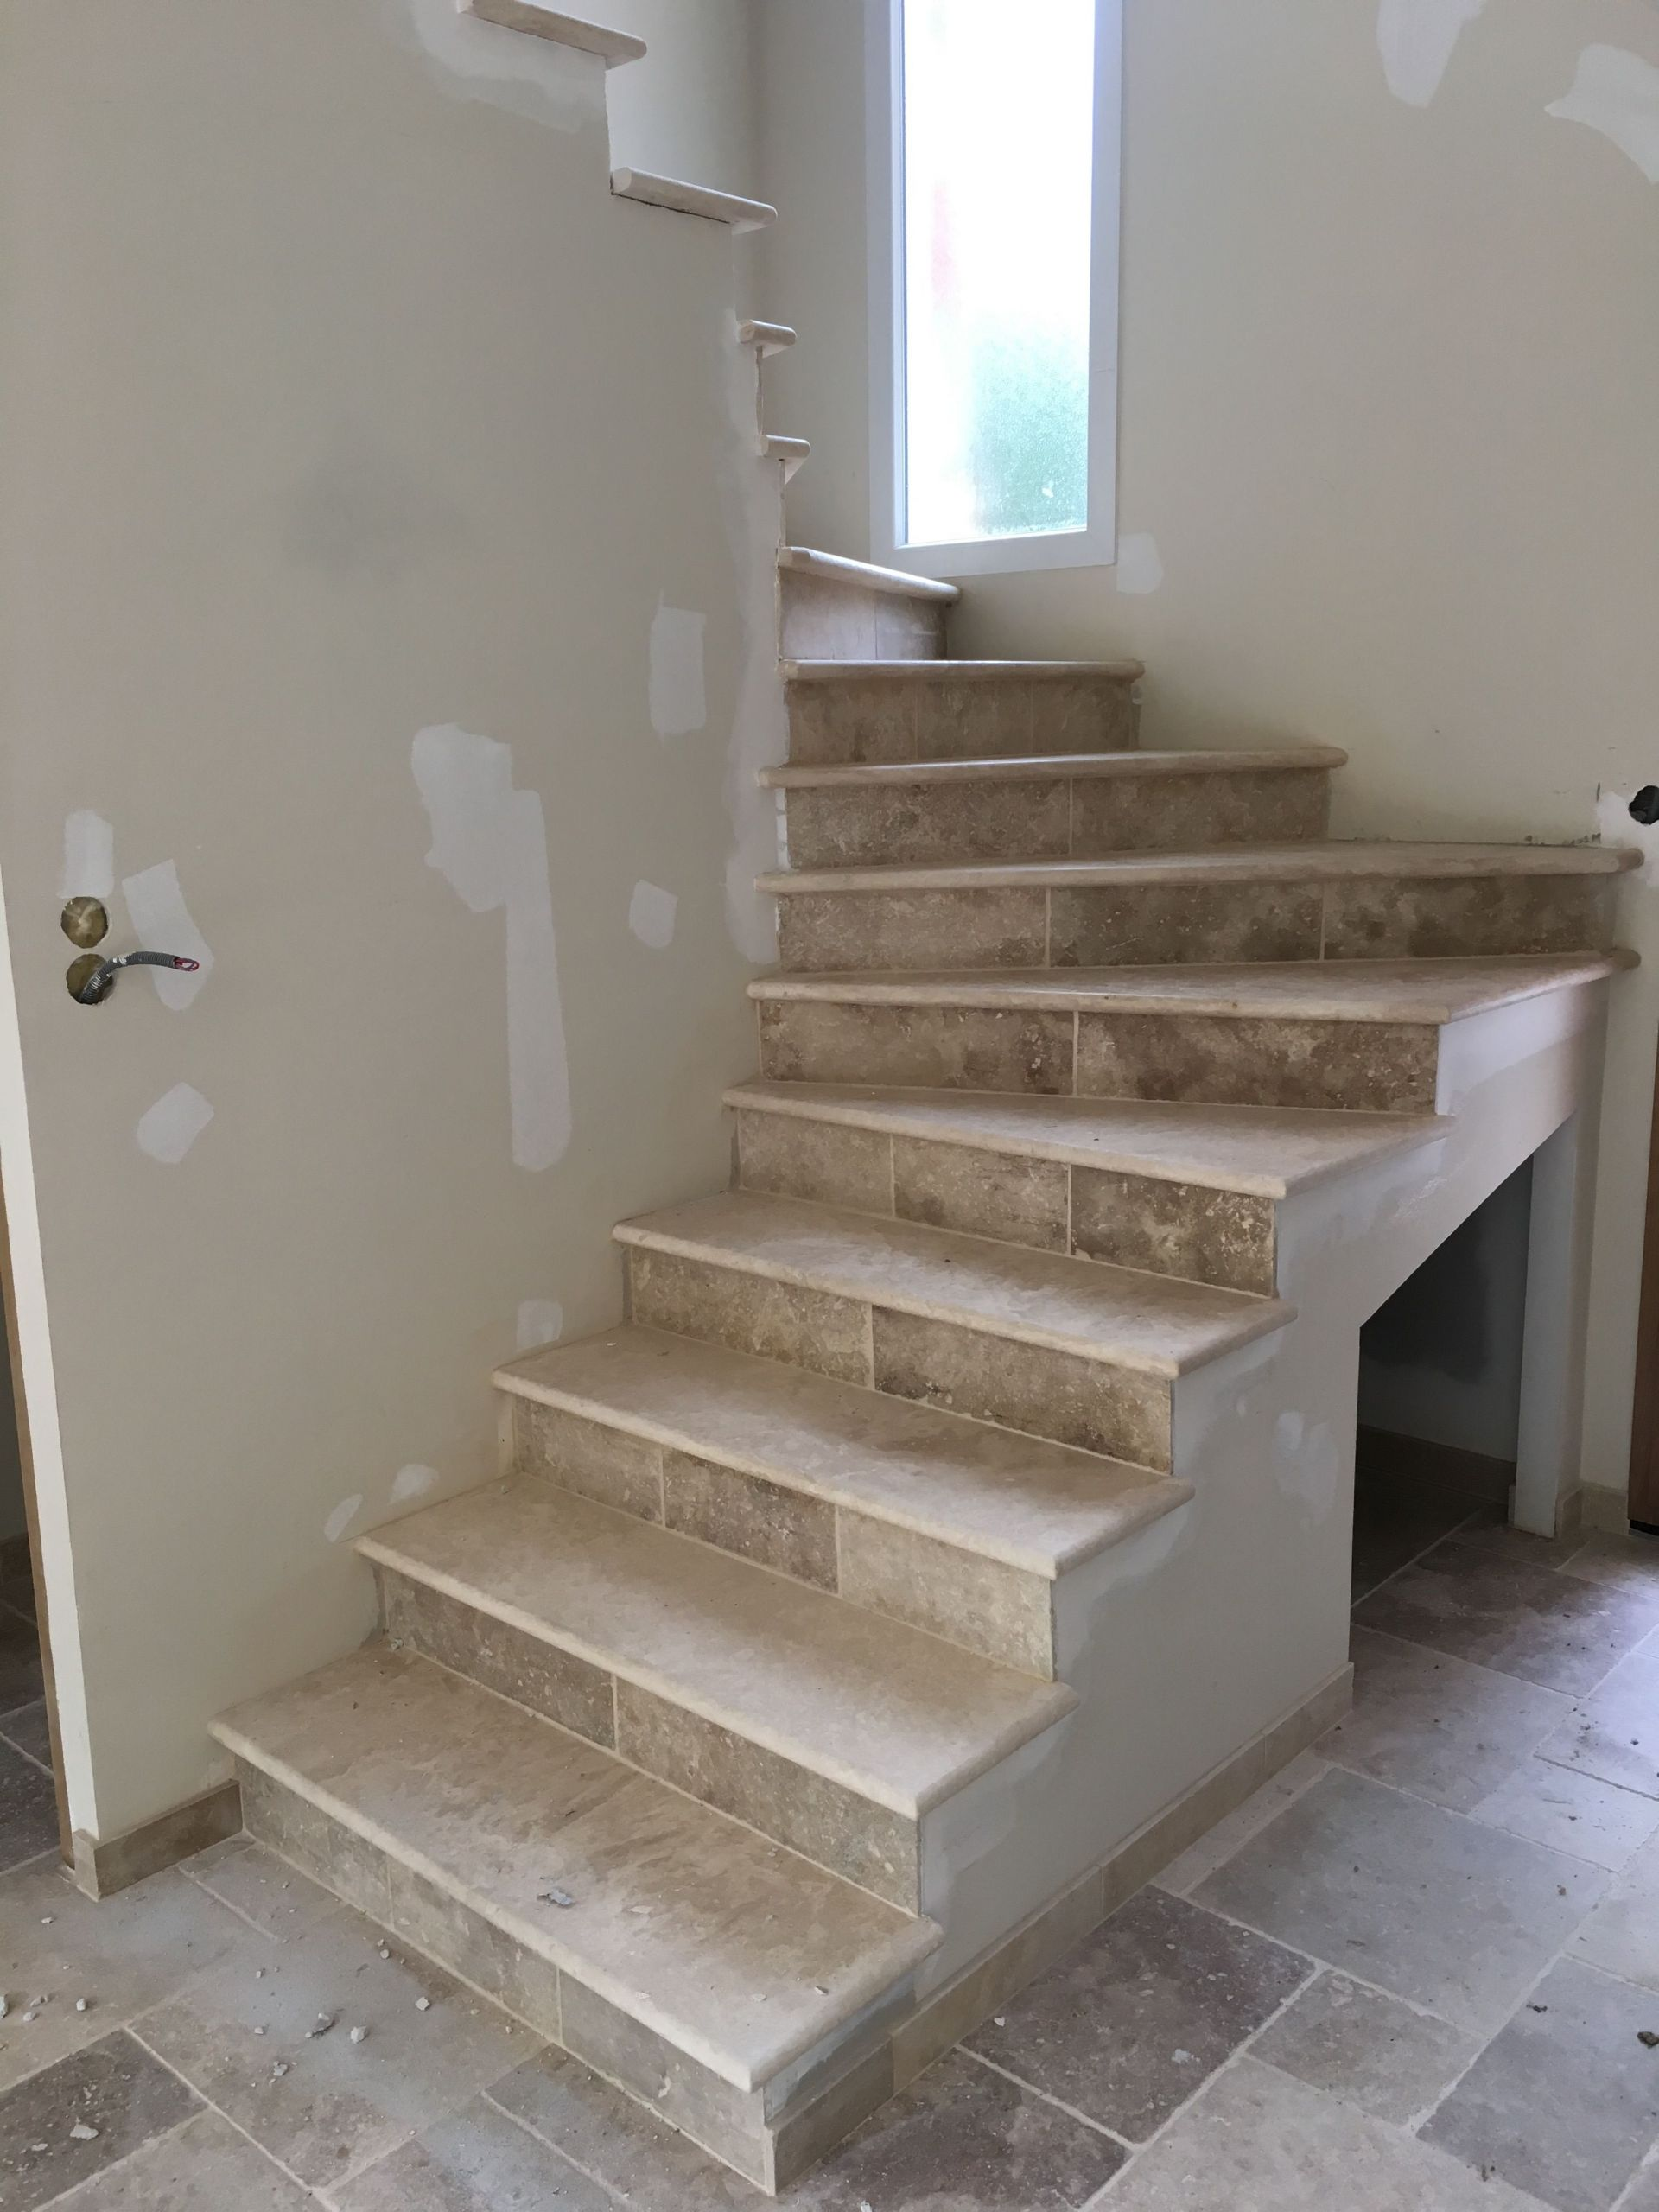 travertin escalier marche en 3cm bord arrondi sur mesure